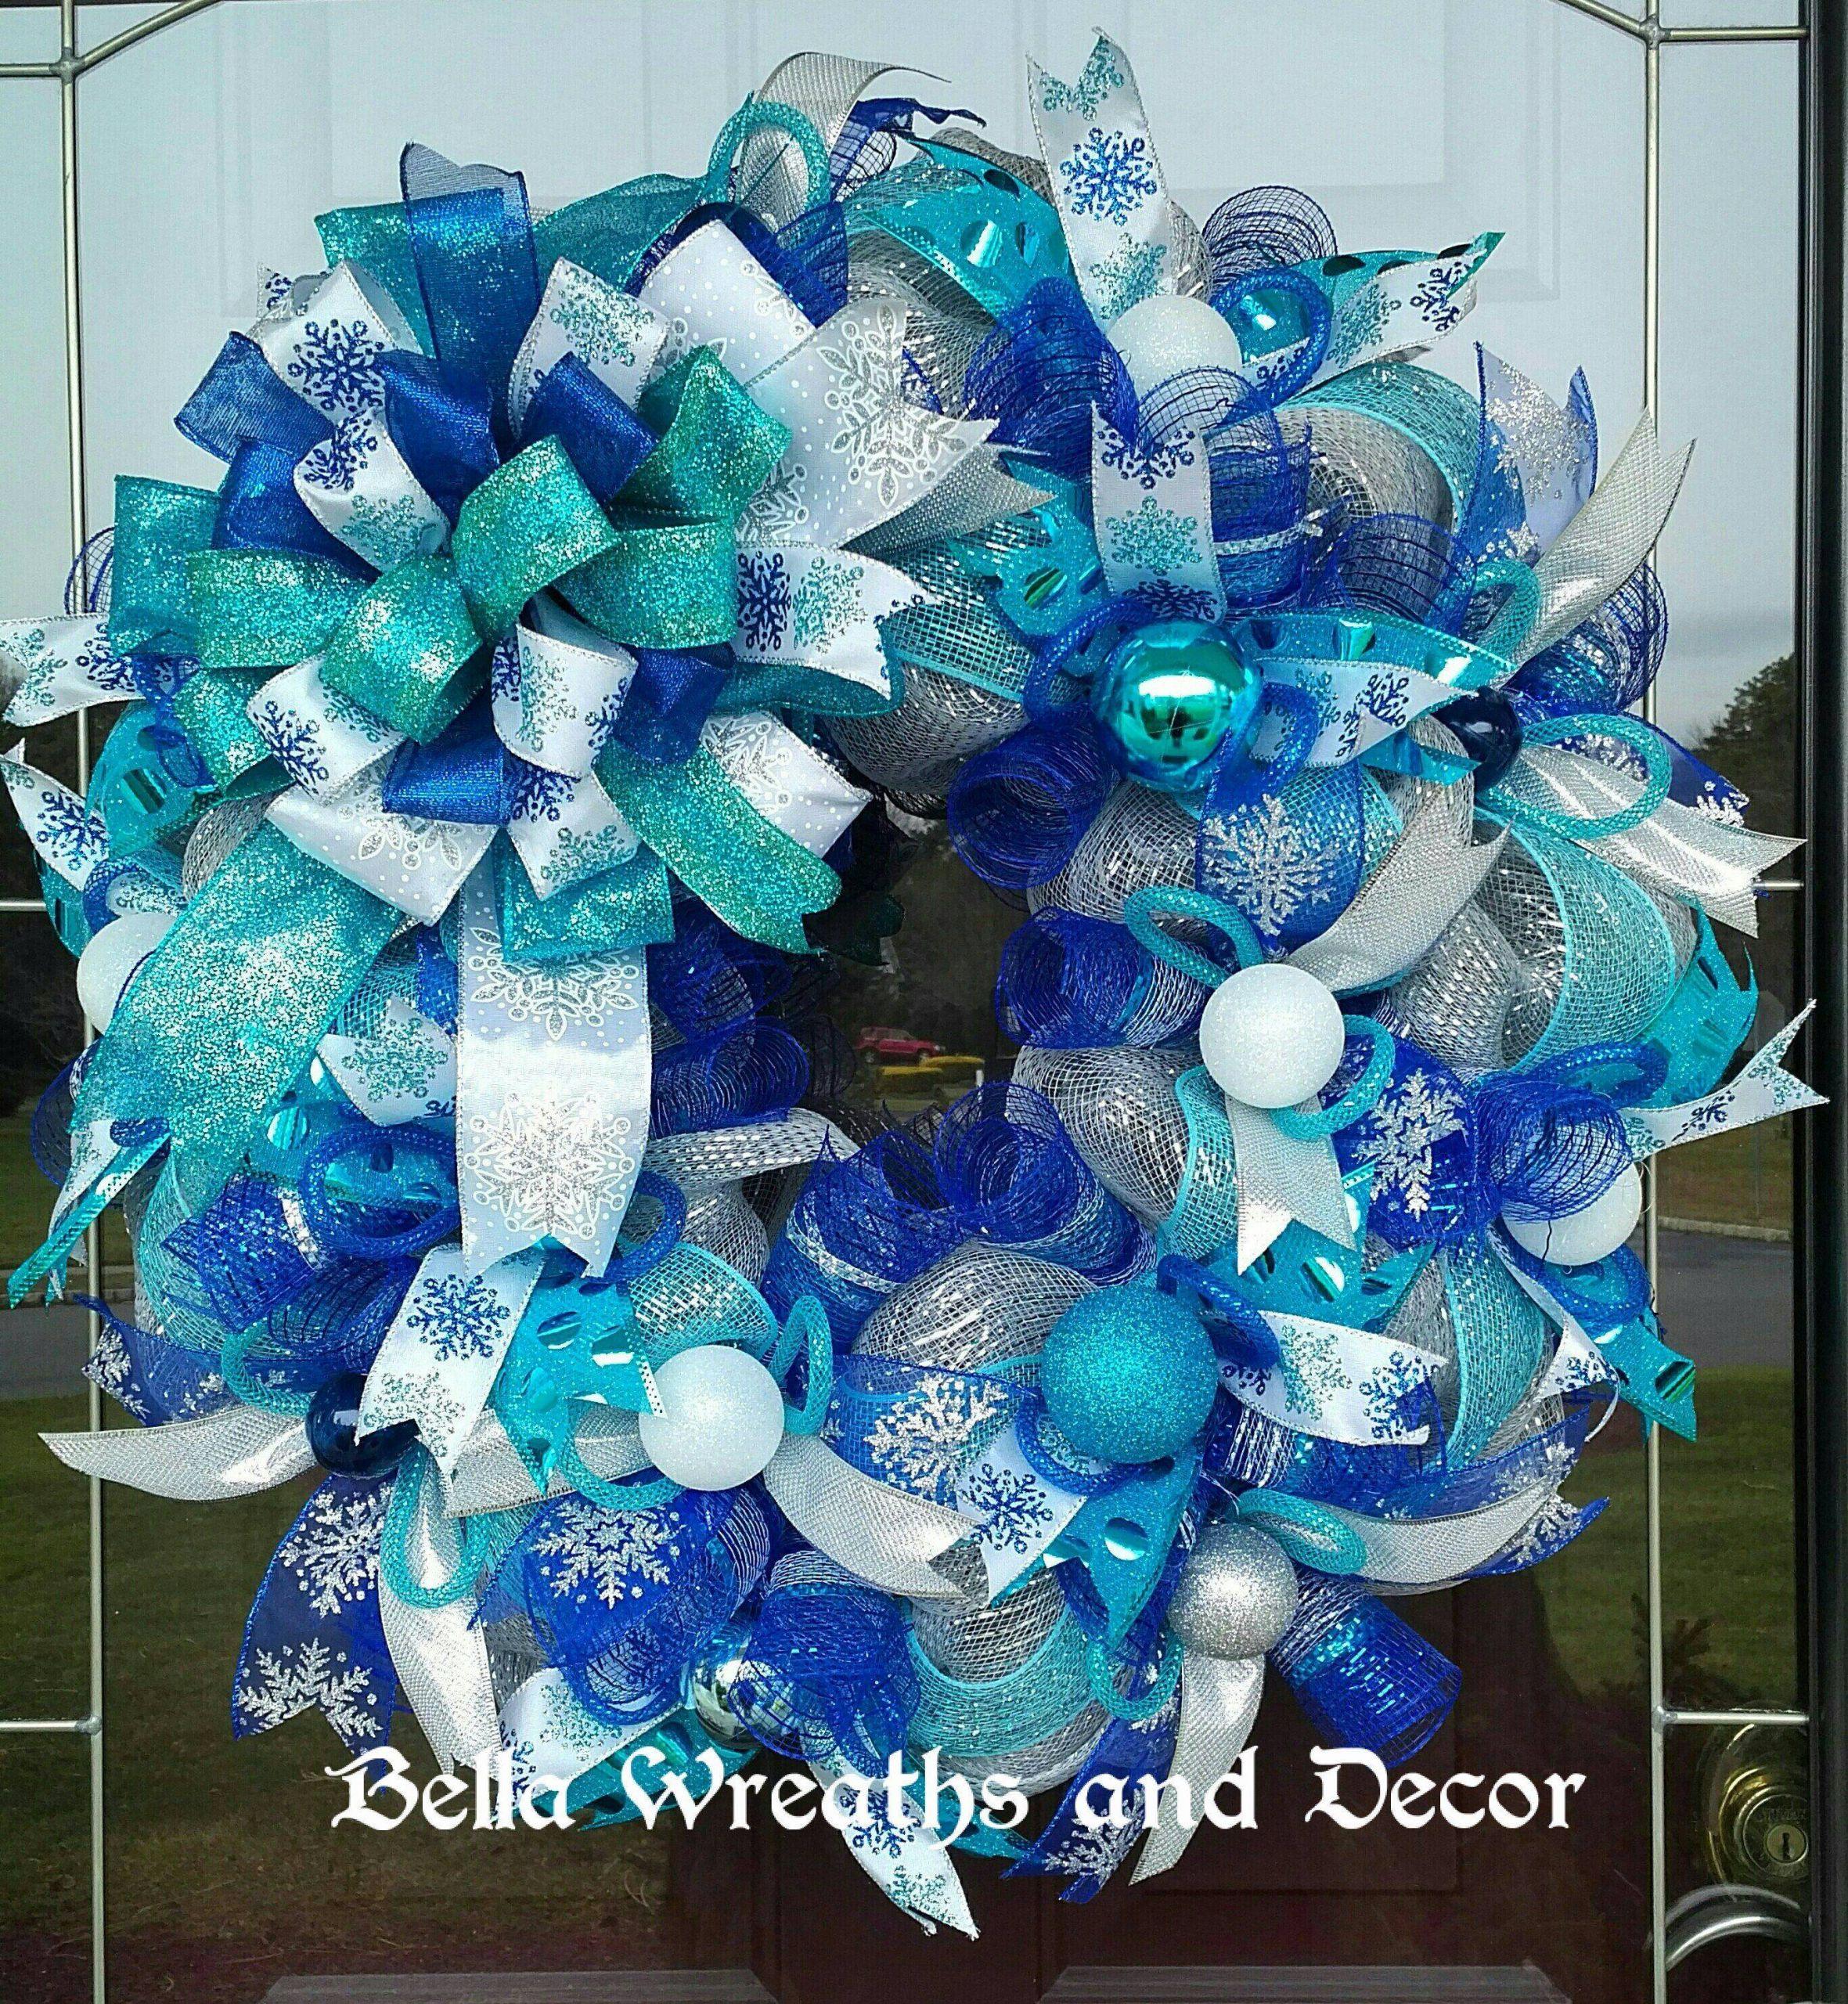 Aqua Blue Christmas Decorations New Winter Wreath Blue Winter Wreath Holiday Wreath Christmas